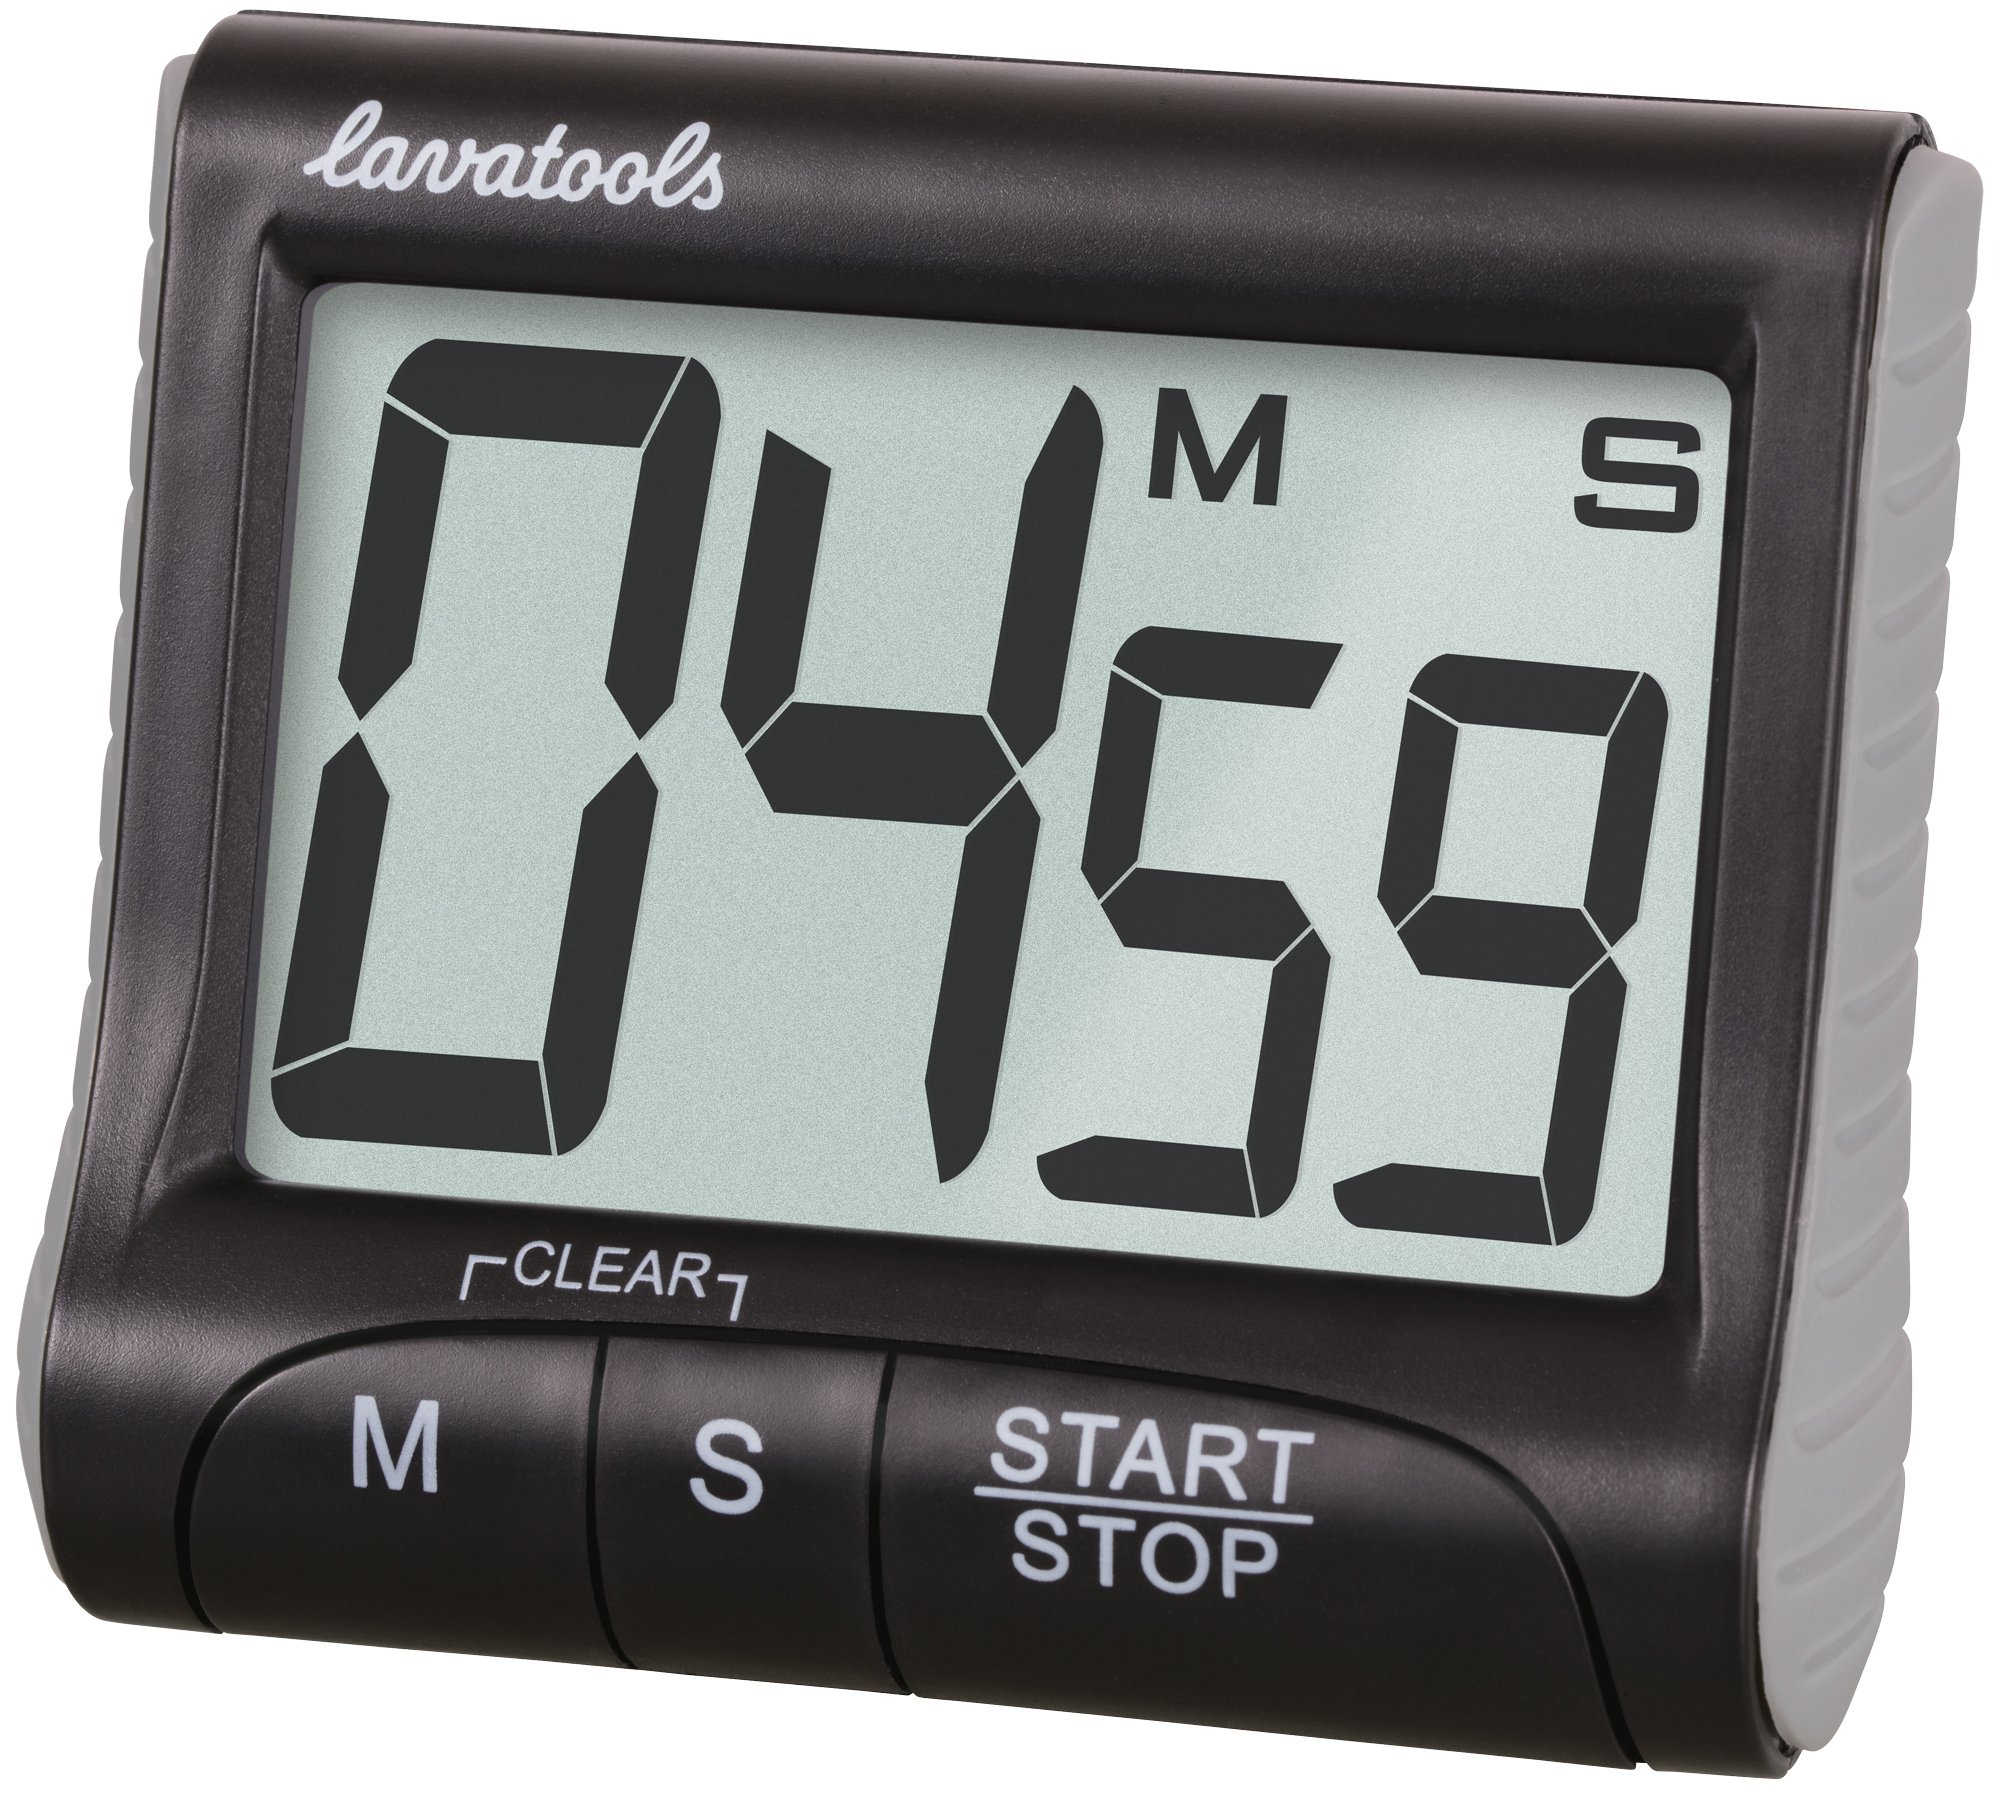 Lavatools KT1 Digital Kitchen Timer & Stopwatch, Large Digits, Loud Alarm, Magnetic Stand (Black) by Lavatools